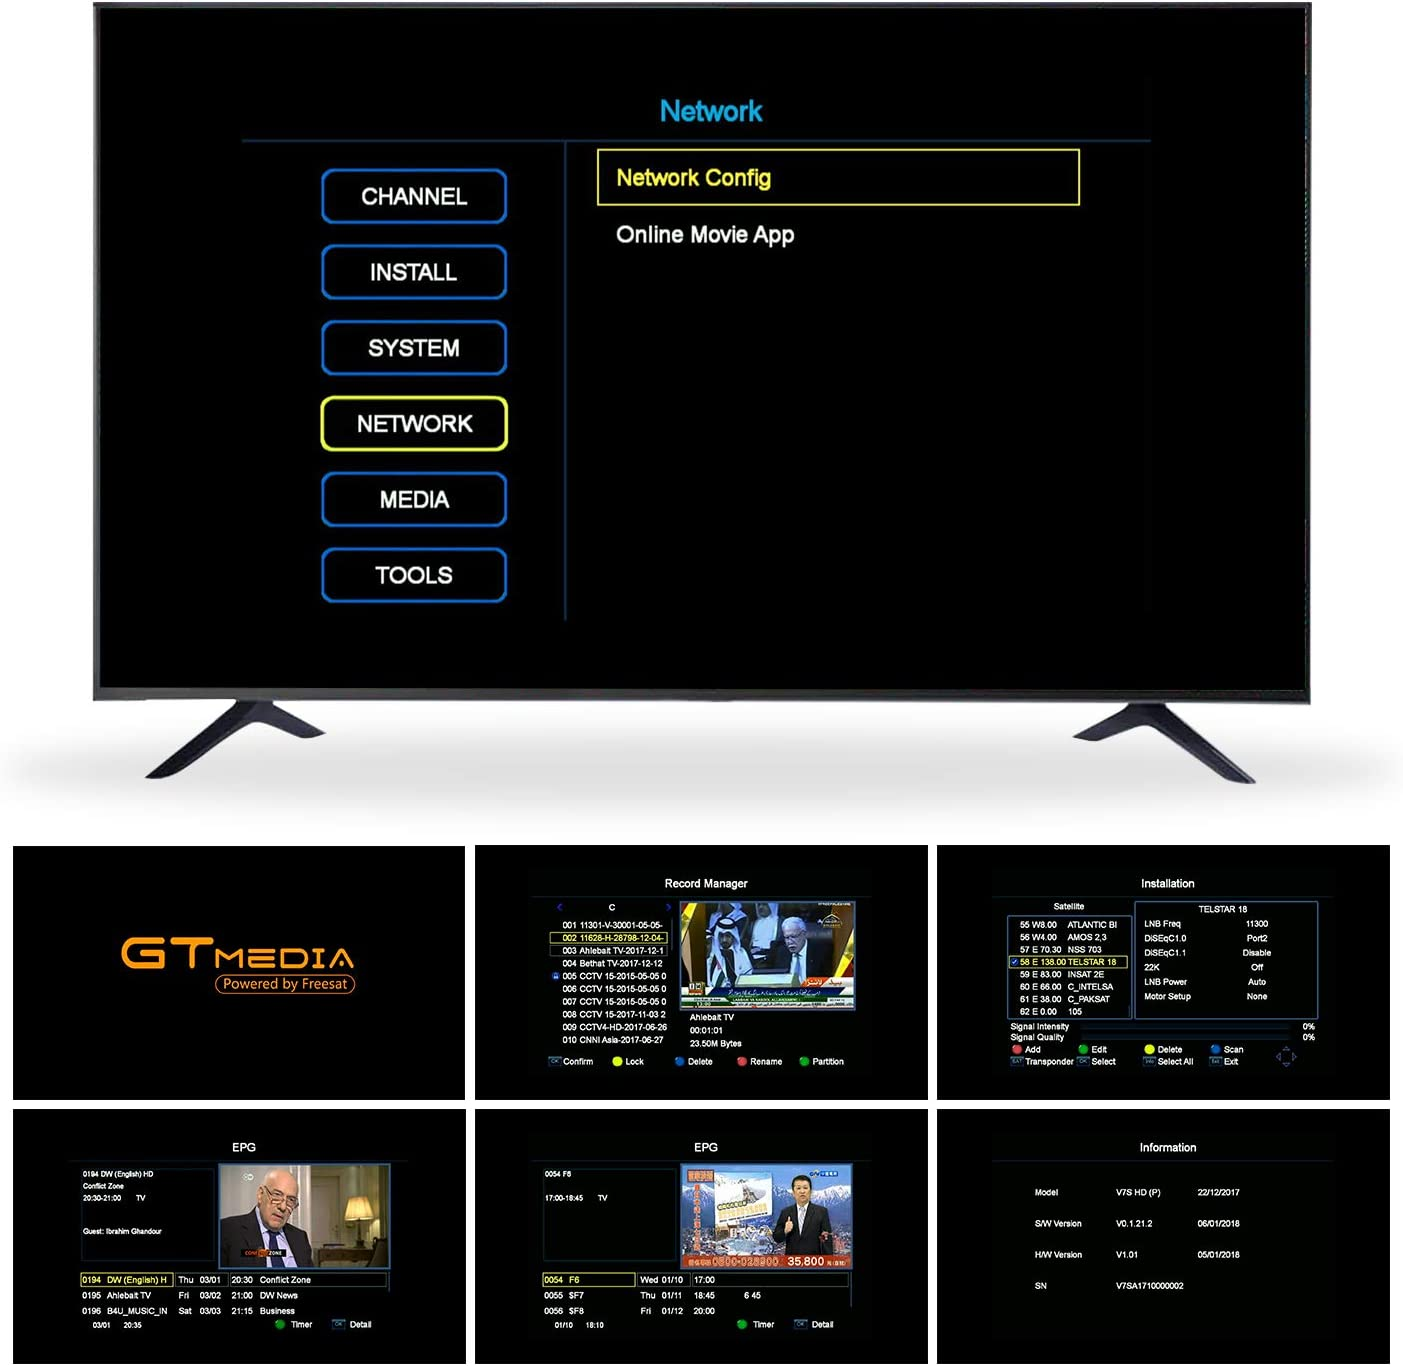 GT MEDIA V7S HD Receptor Satélite DVB-S/S2 Decodificador de TV por Satelite con Antena WiFi USB, 1080P Full HD Soporte PVR CCcam Youtube Astra 19.2E (Freesat V7 HD Mejorada): Amazon.es: Electrónica